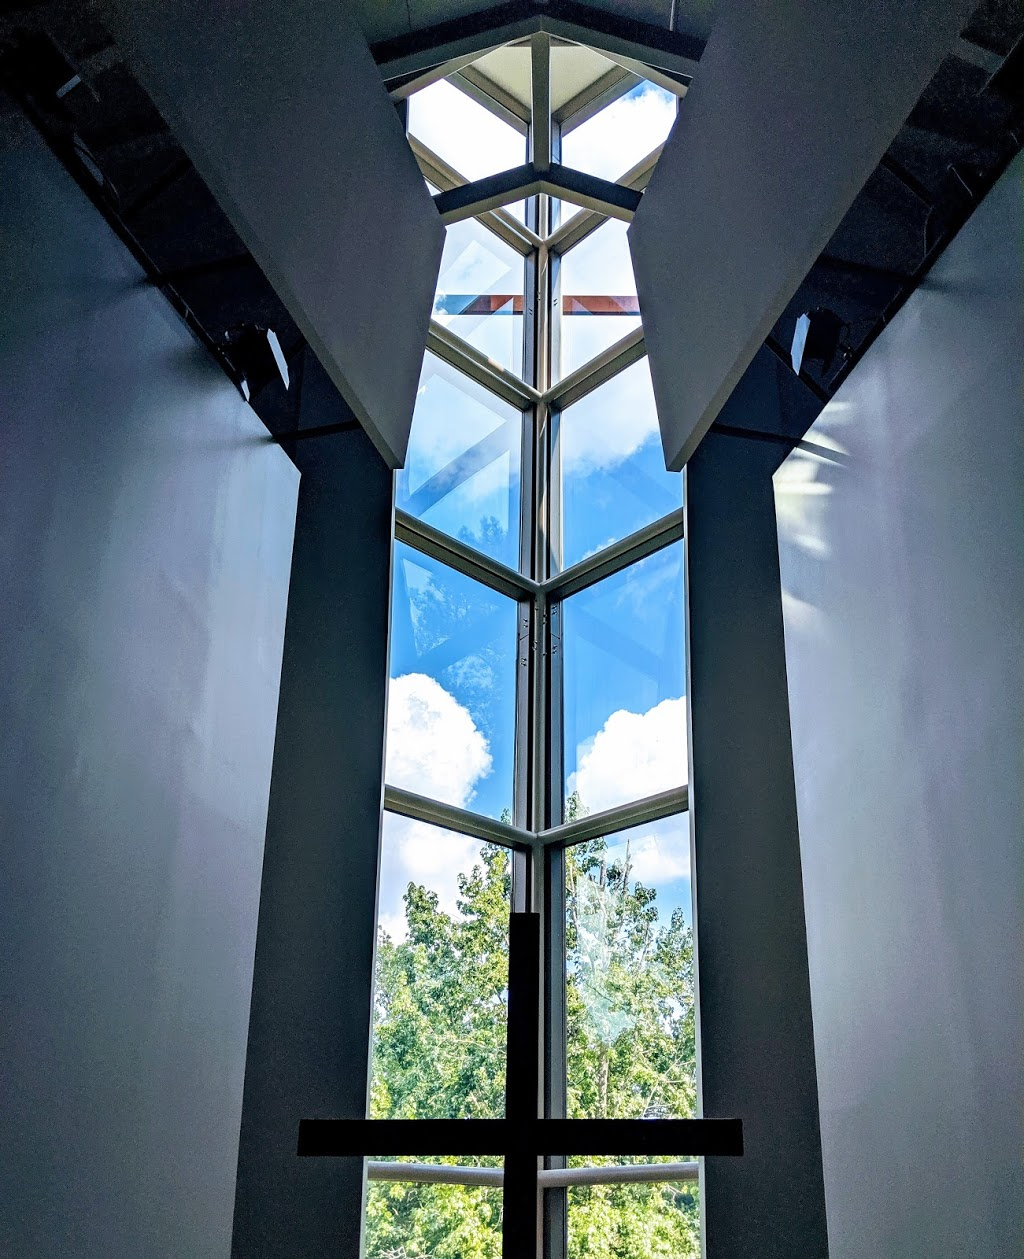 Dunwoody Community Church - church  | Photo 9 of 10 | Address: 2250 Dunwoody Club Dr, Atlanta, GA 30350, USA | Phone: (770) 396-8600